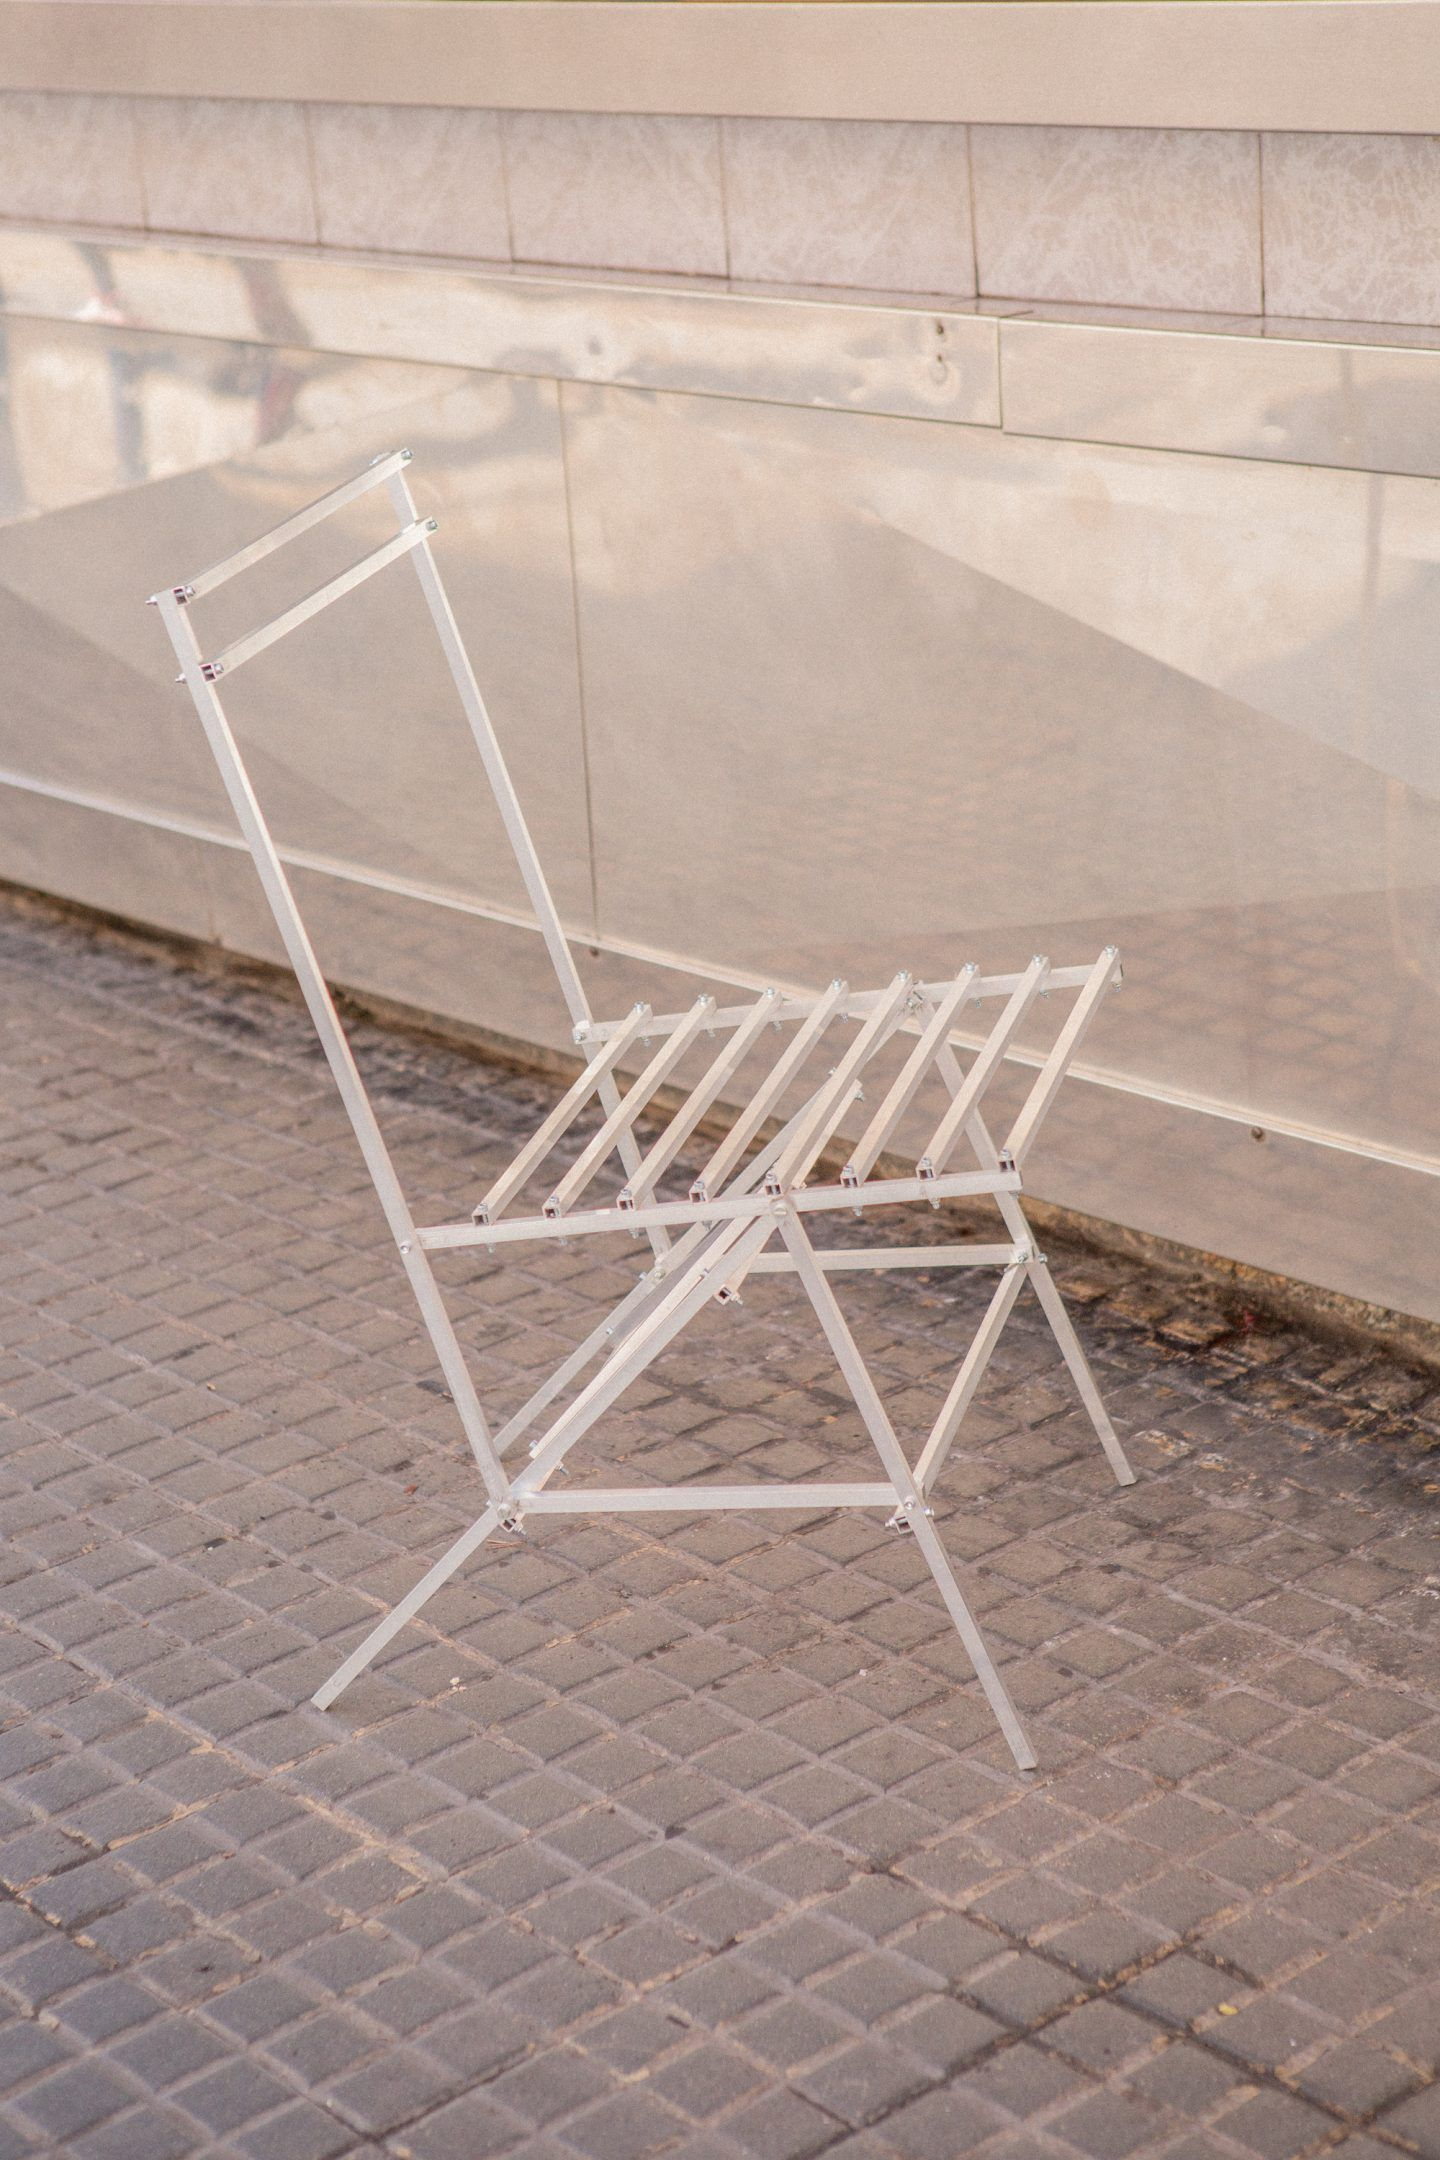 IGNANT-Art-Marta-Armengol-010